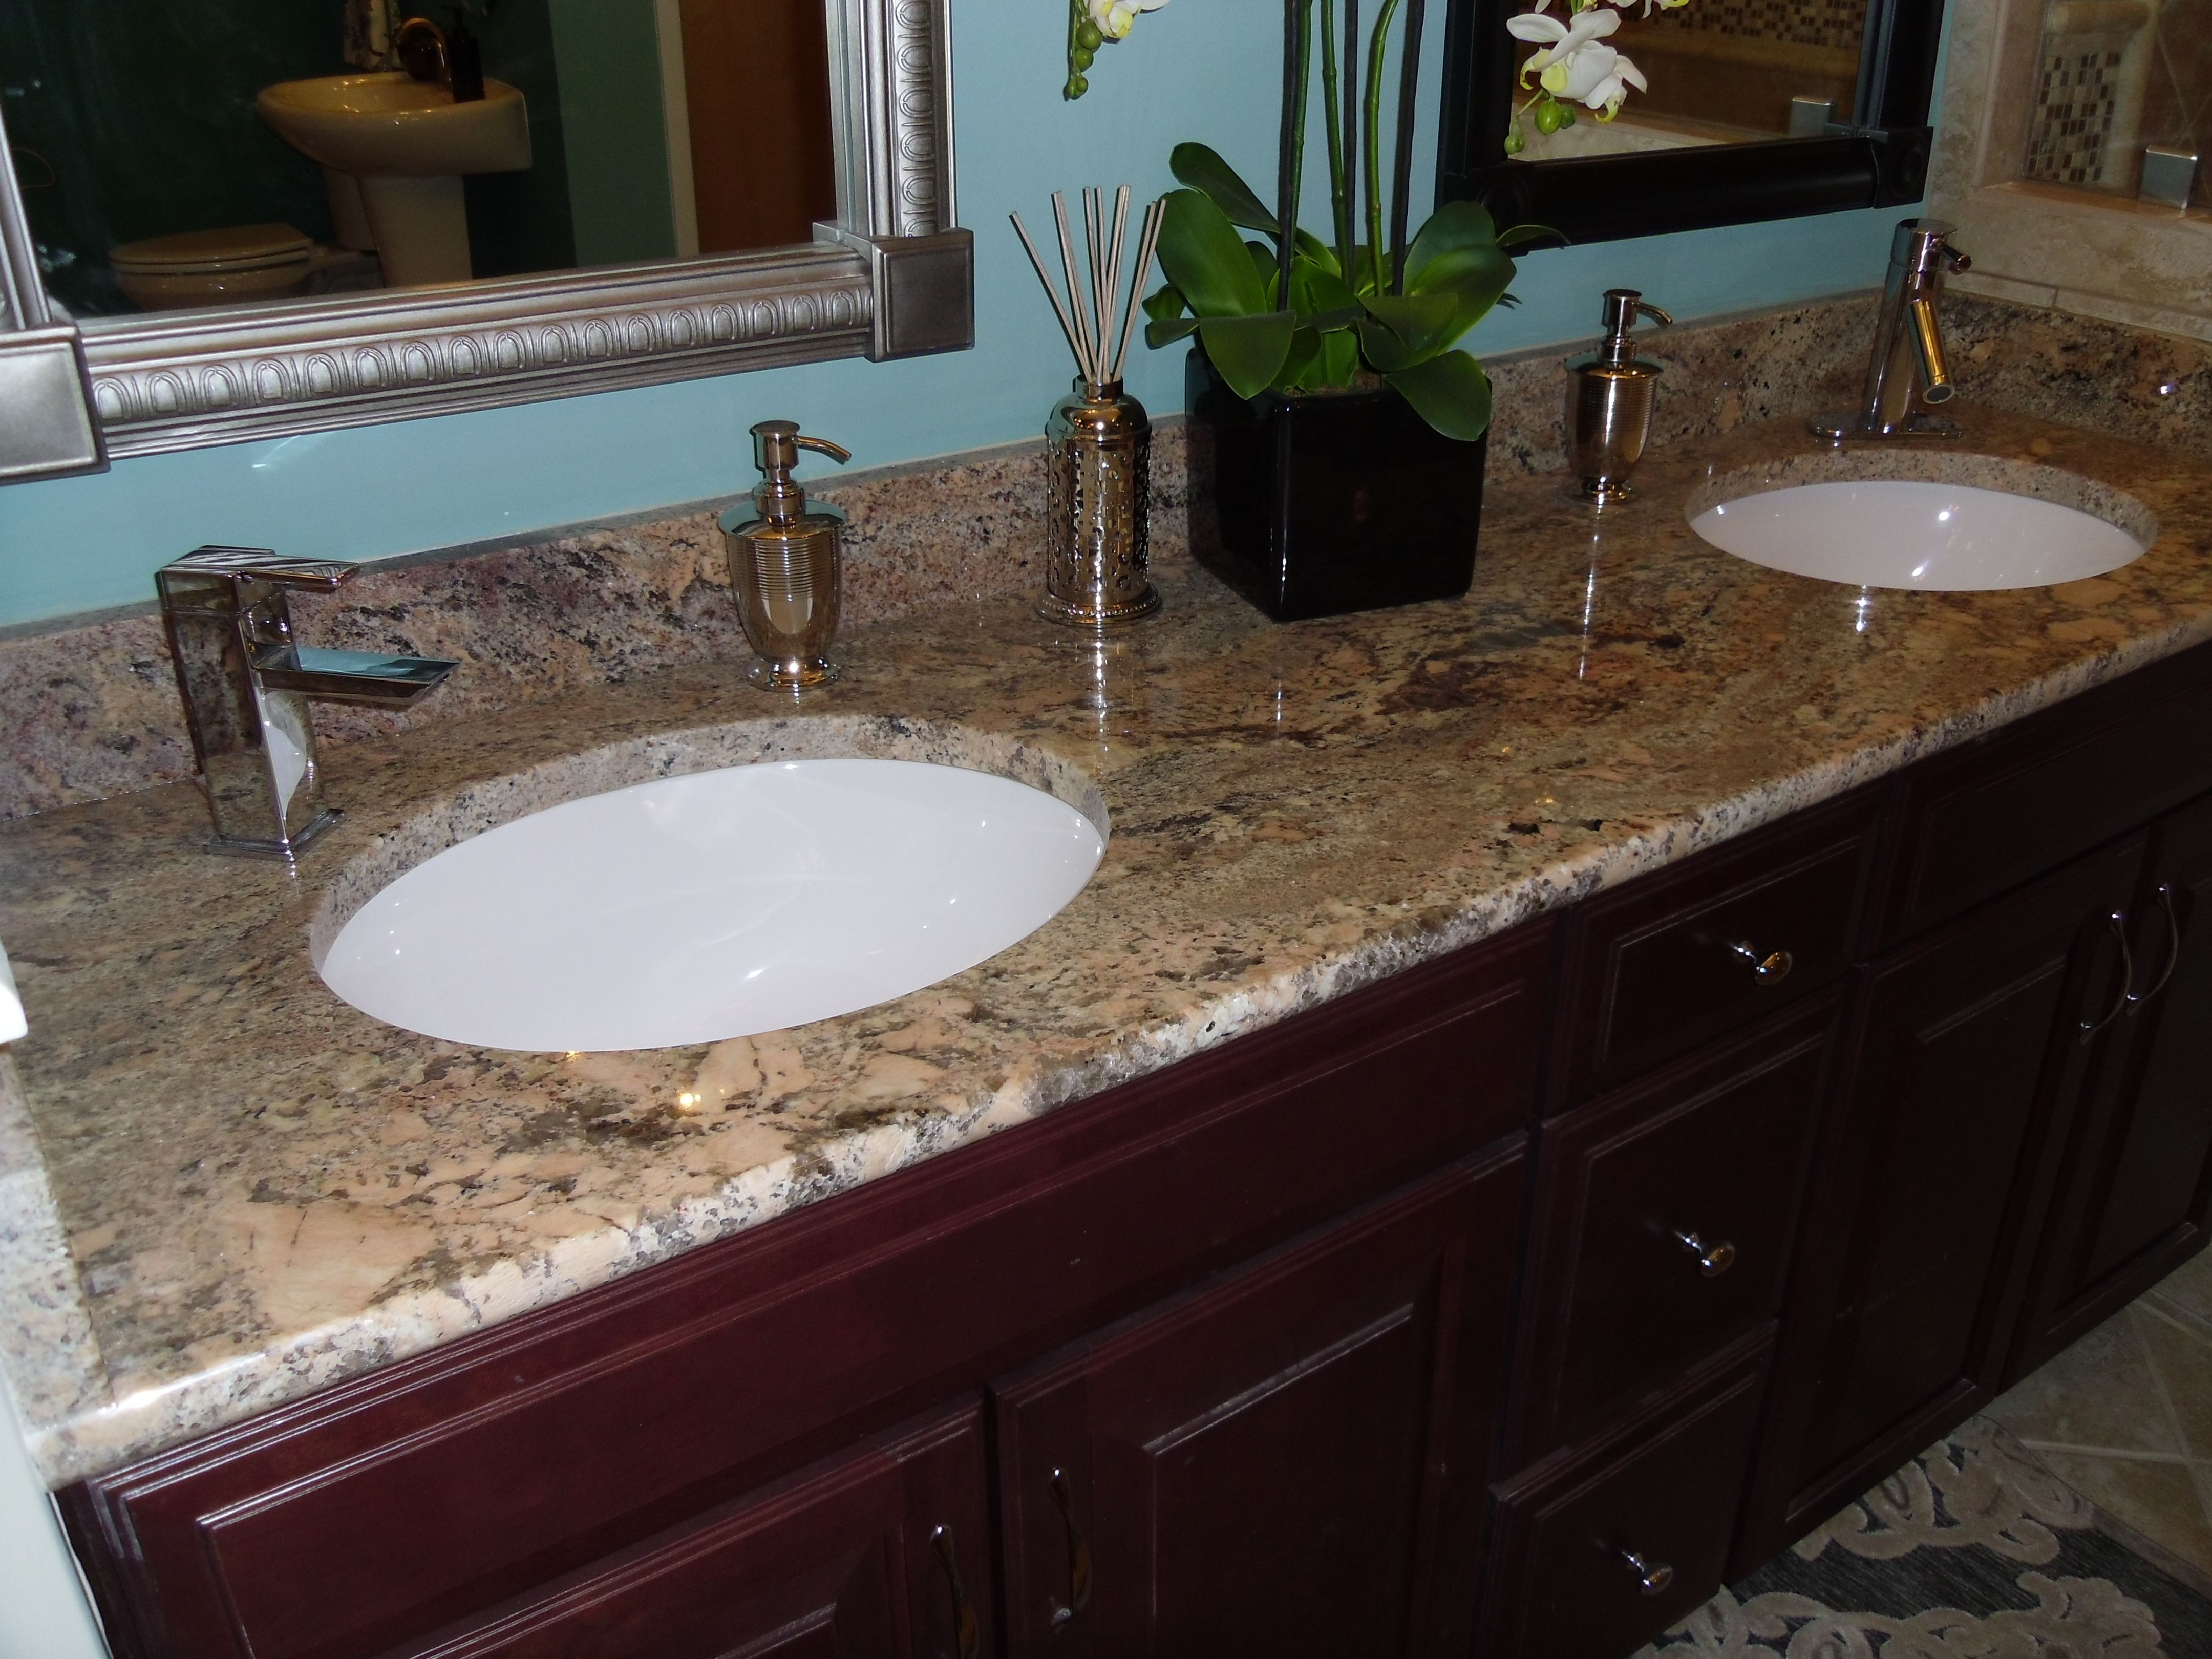 wilsonart jamocha granite crema bordeaux with bullnose edge undermount sinks kitchen. Black Bedroom Furniture Sets. Home Design Ideas